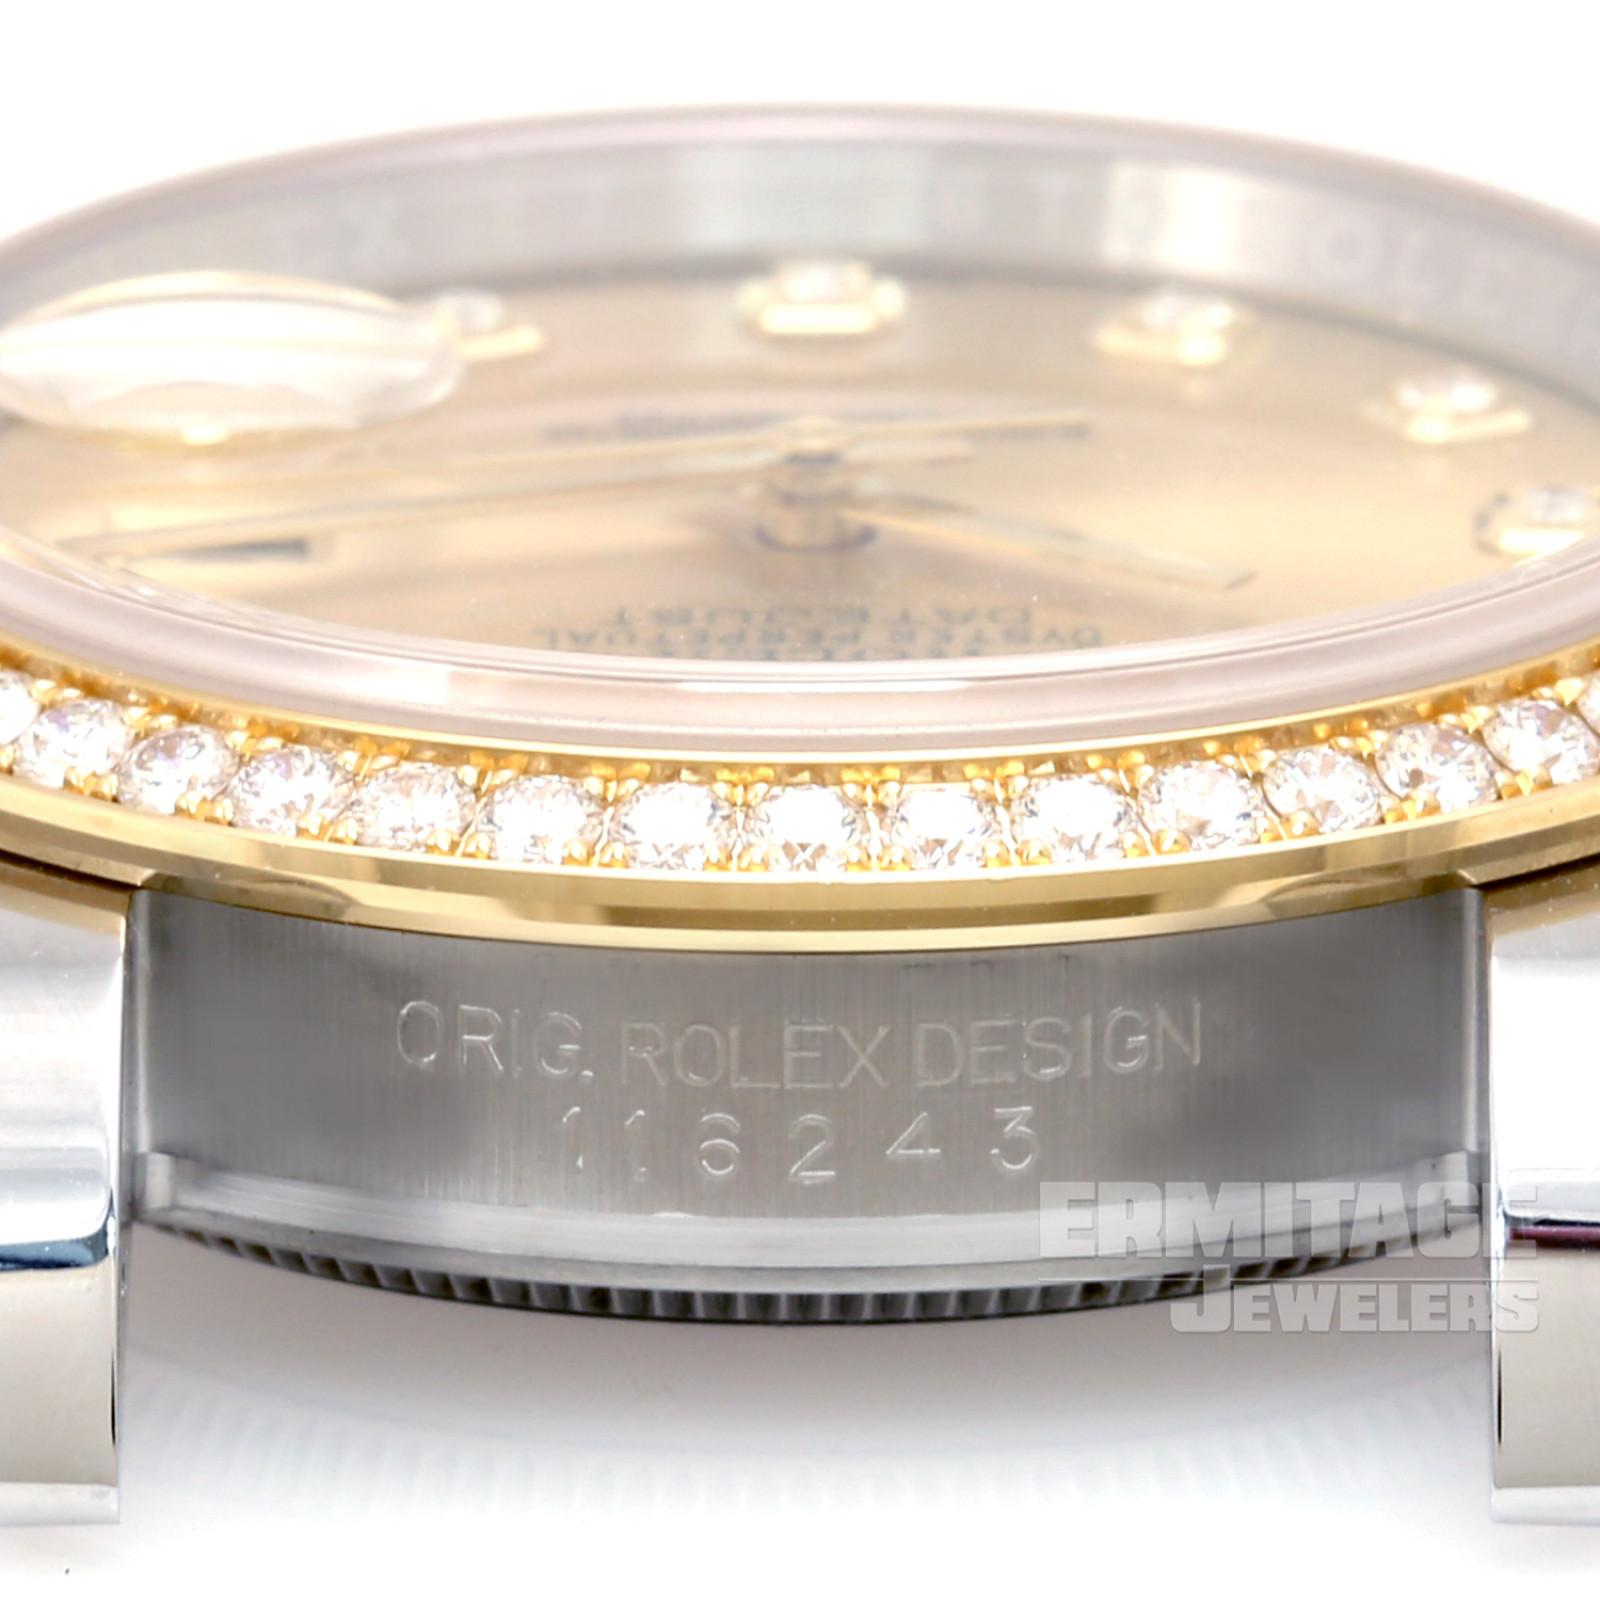 Gold on Jubilee Rolex Datejust 116243 36 mm